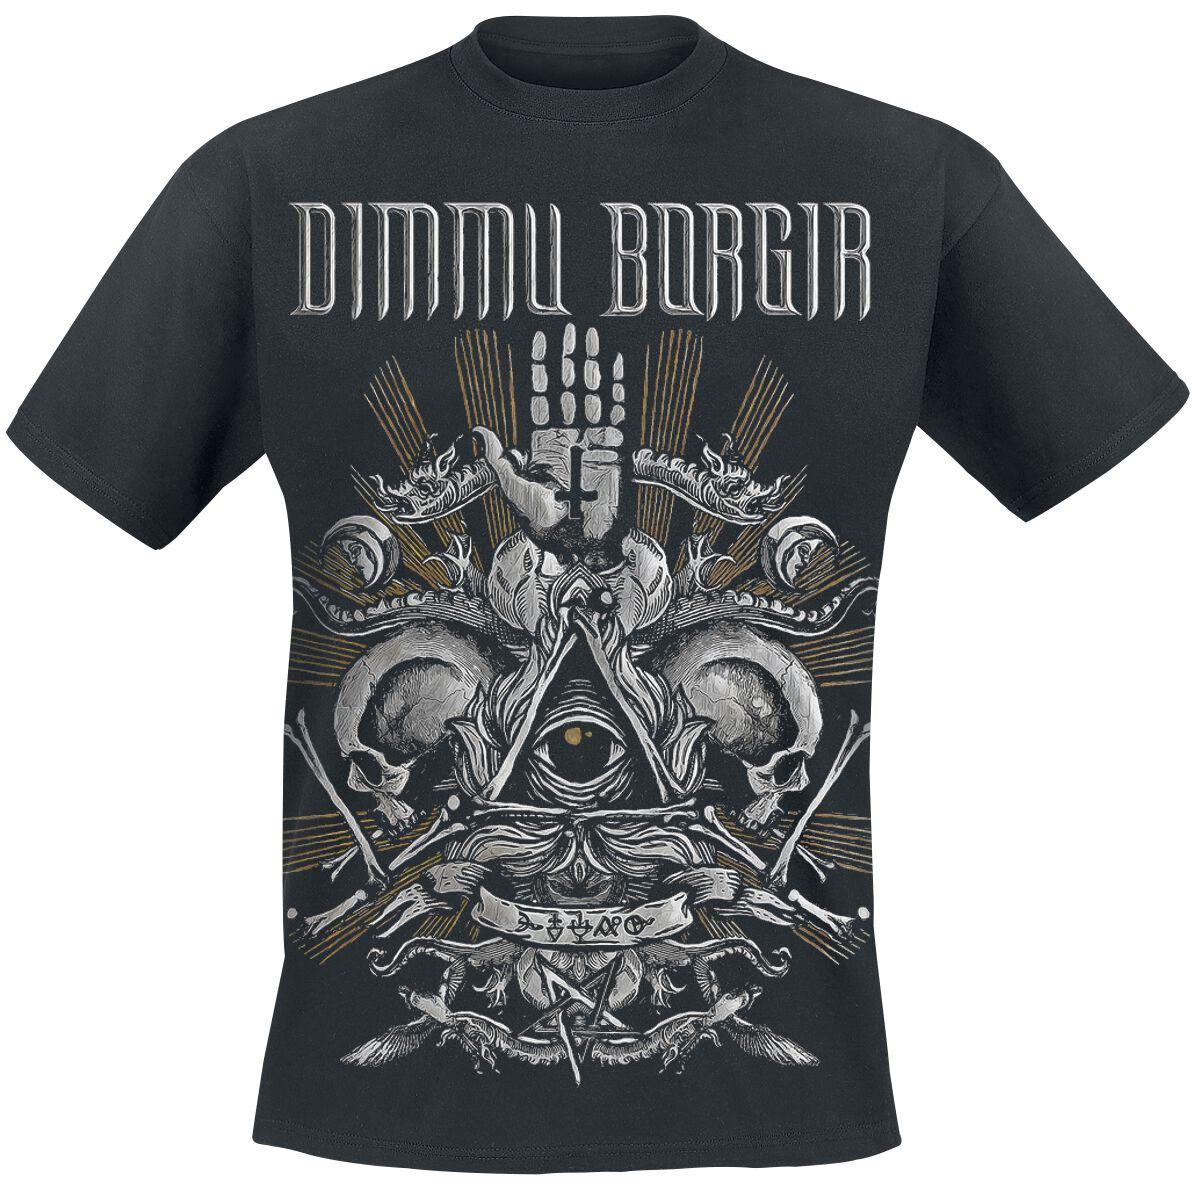 Zespoły - Koszulki - T-Shirt Dimmu Borgir Life is the Trial T-Shirt czarny - 356898